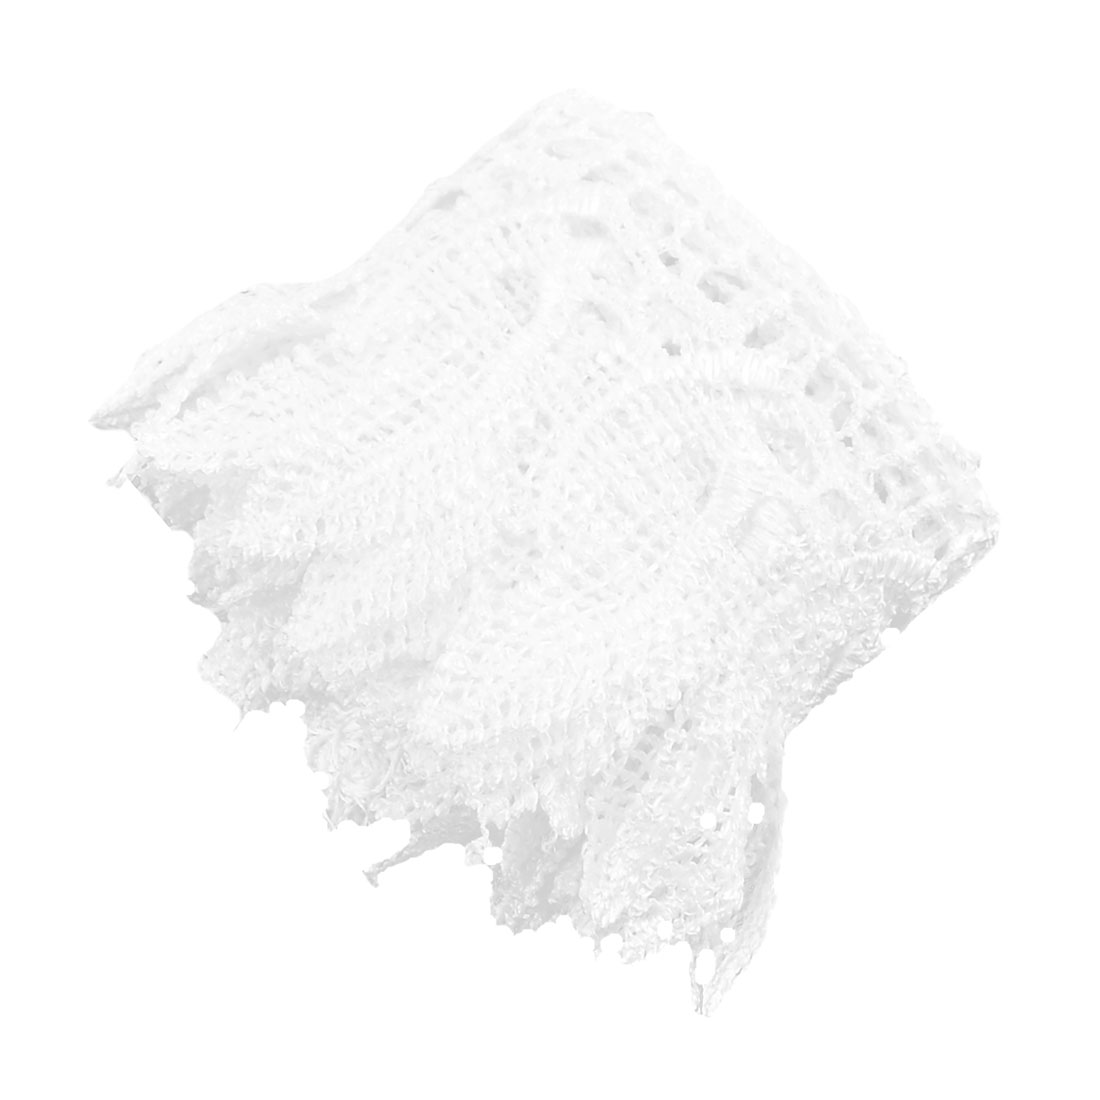 Polyester Tassel Decor Neckline Embellishment Lace Trim Applique 2.4 Inches Width